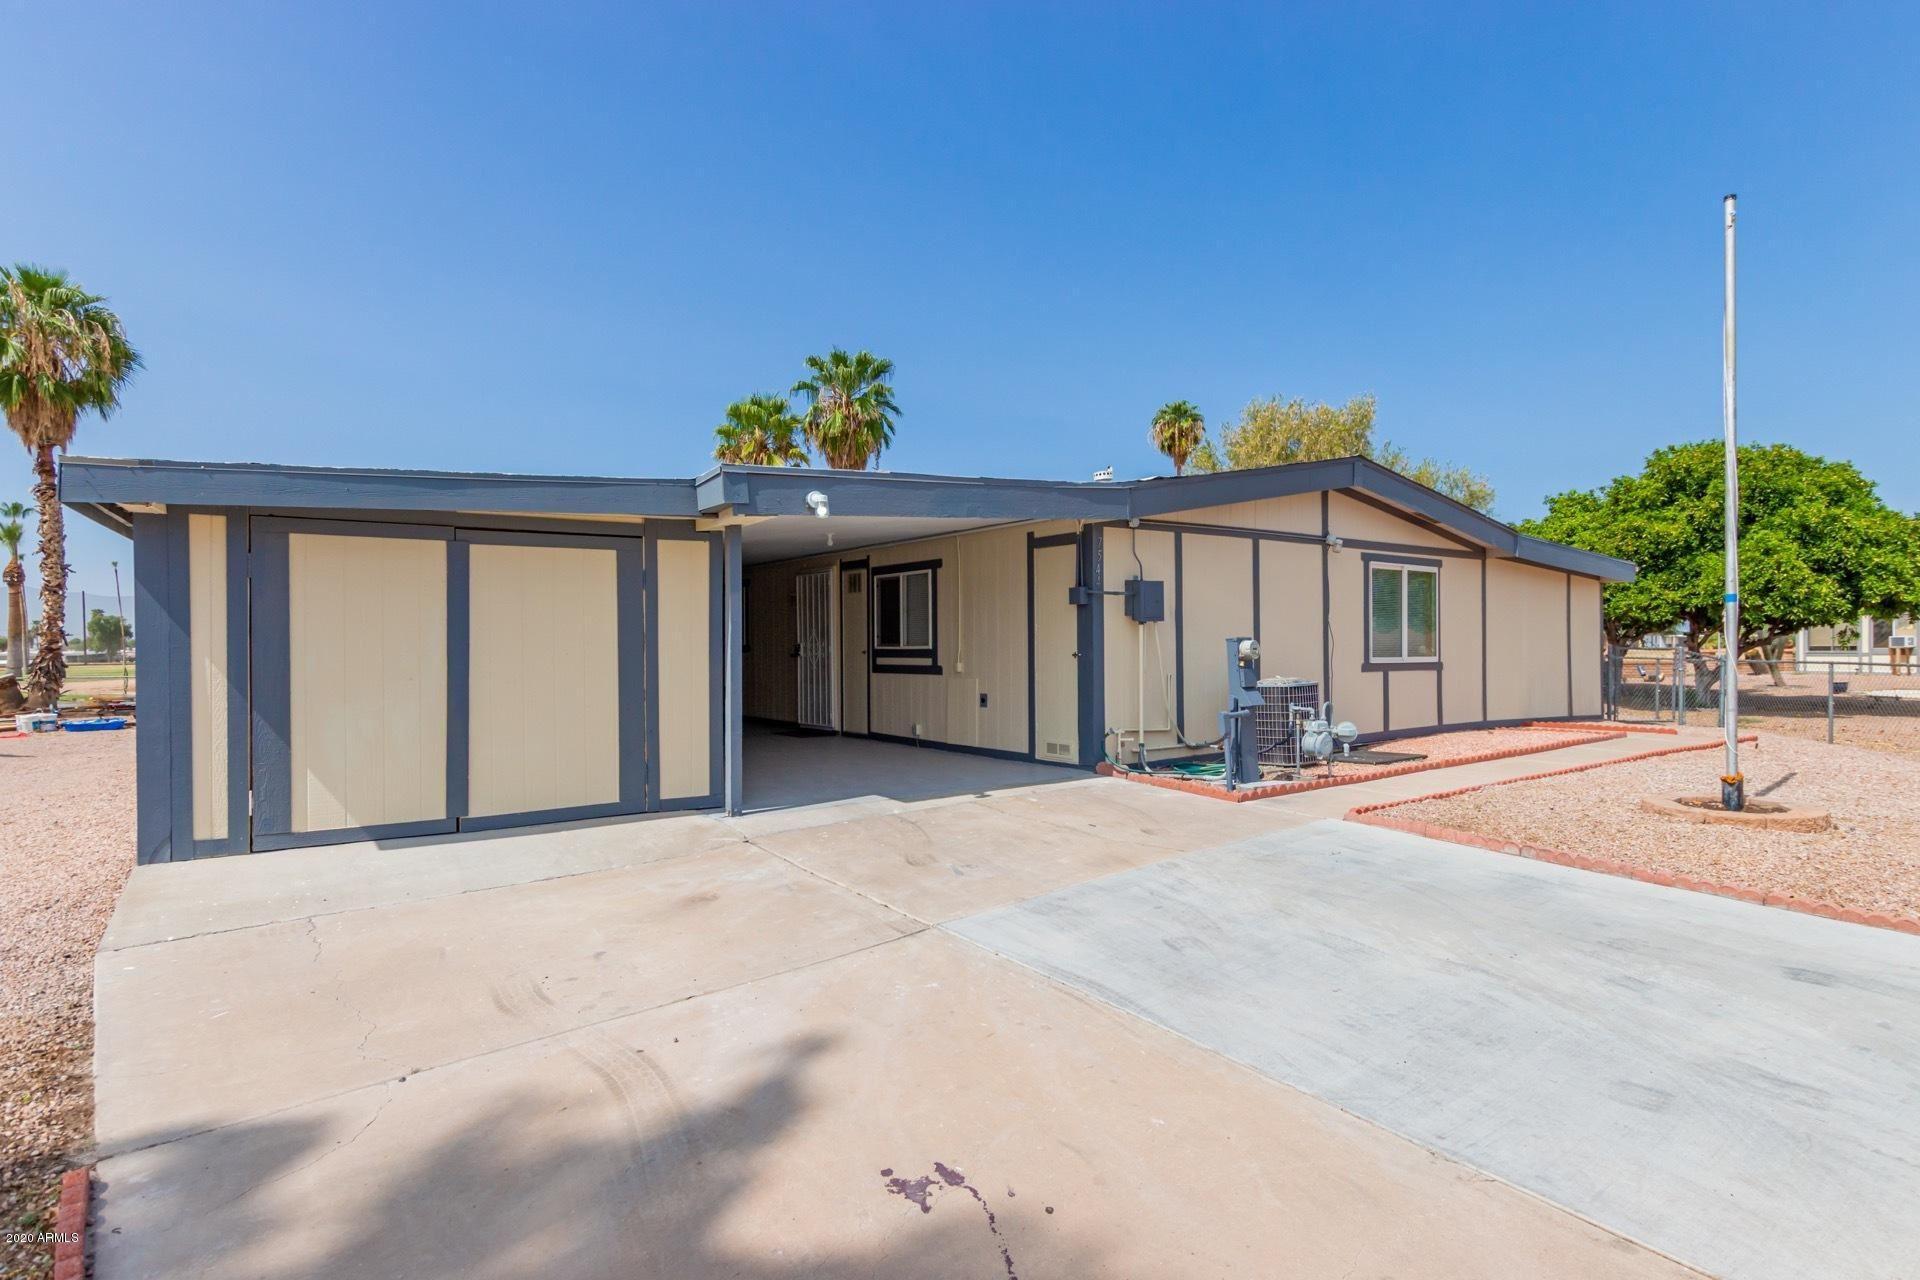 7544 E JUANITA Avenue, Mesa, AZ 85209 - MLS#: 6132054